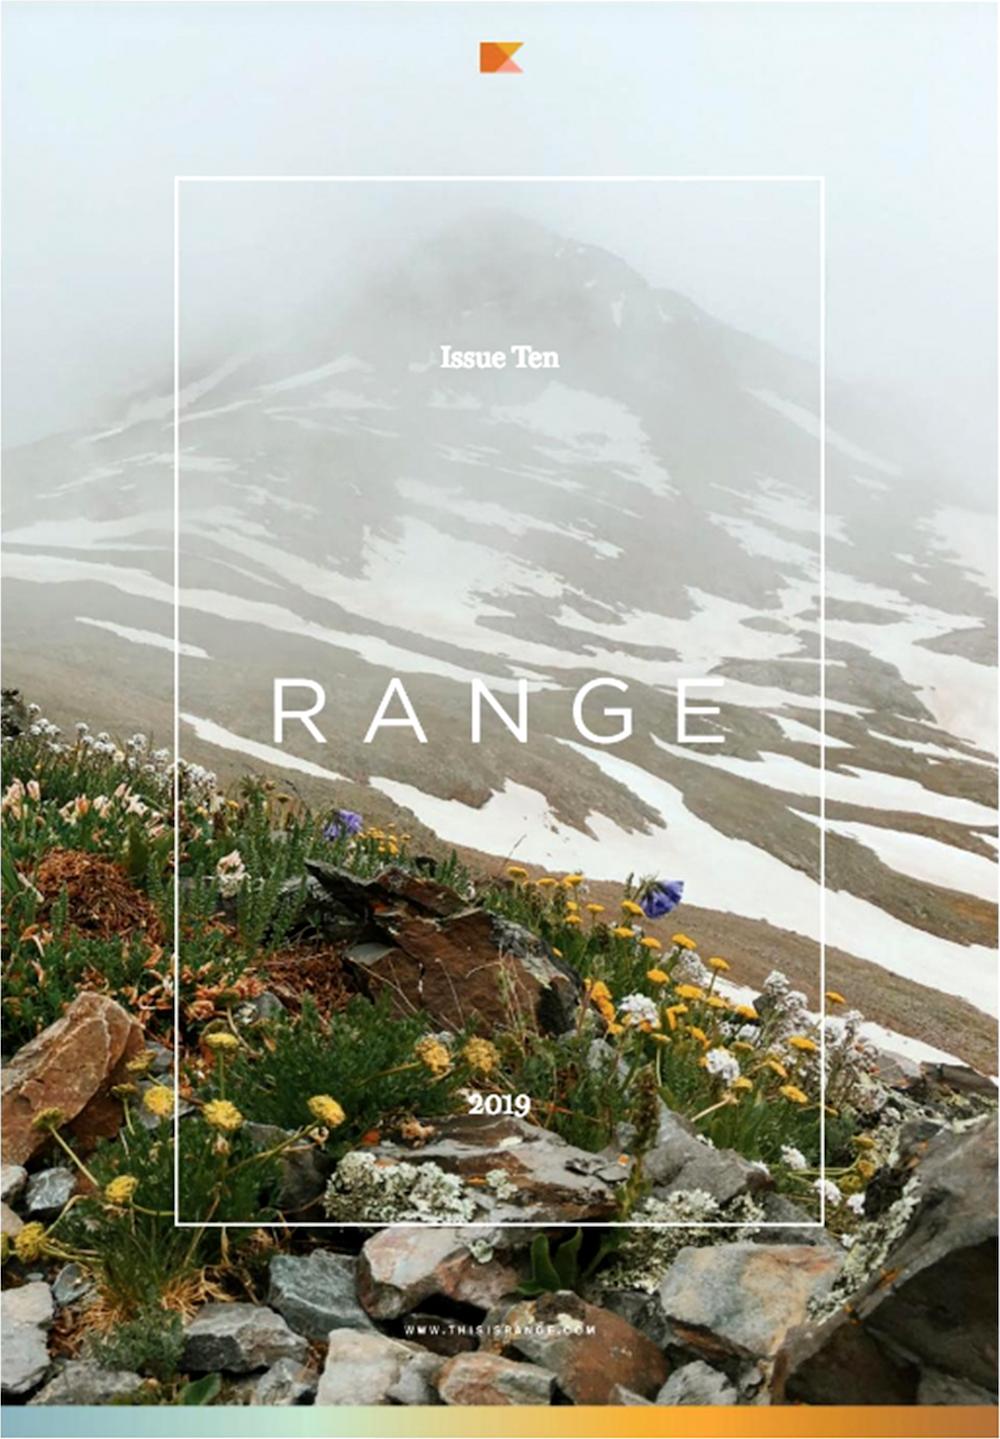 Range Magazine Issue 10 cover